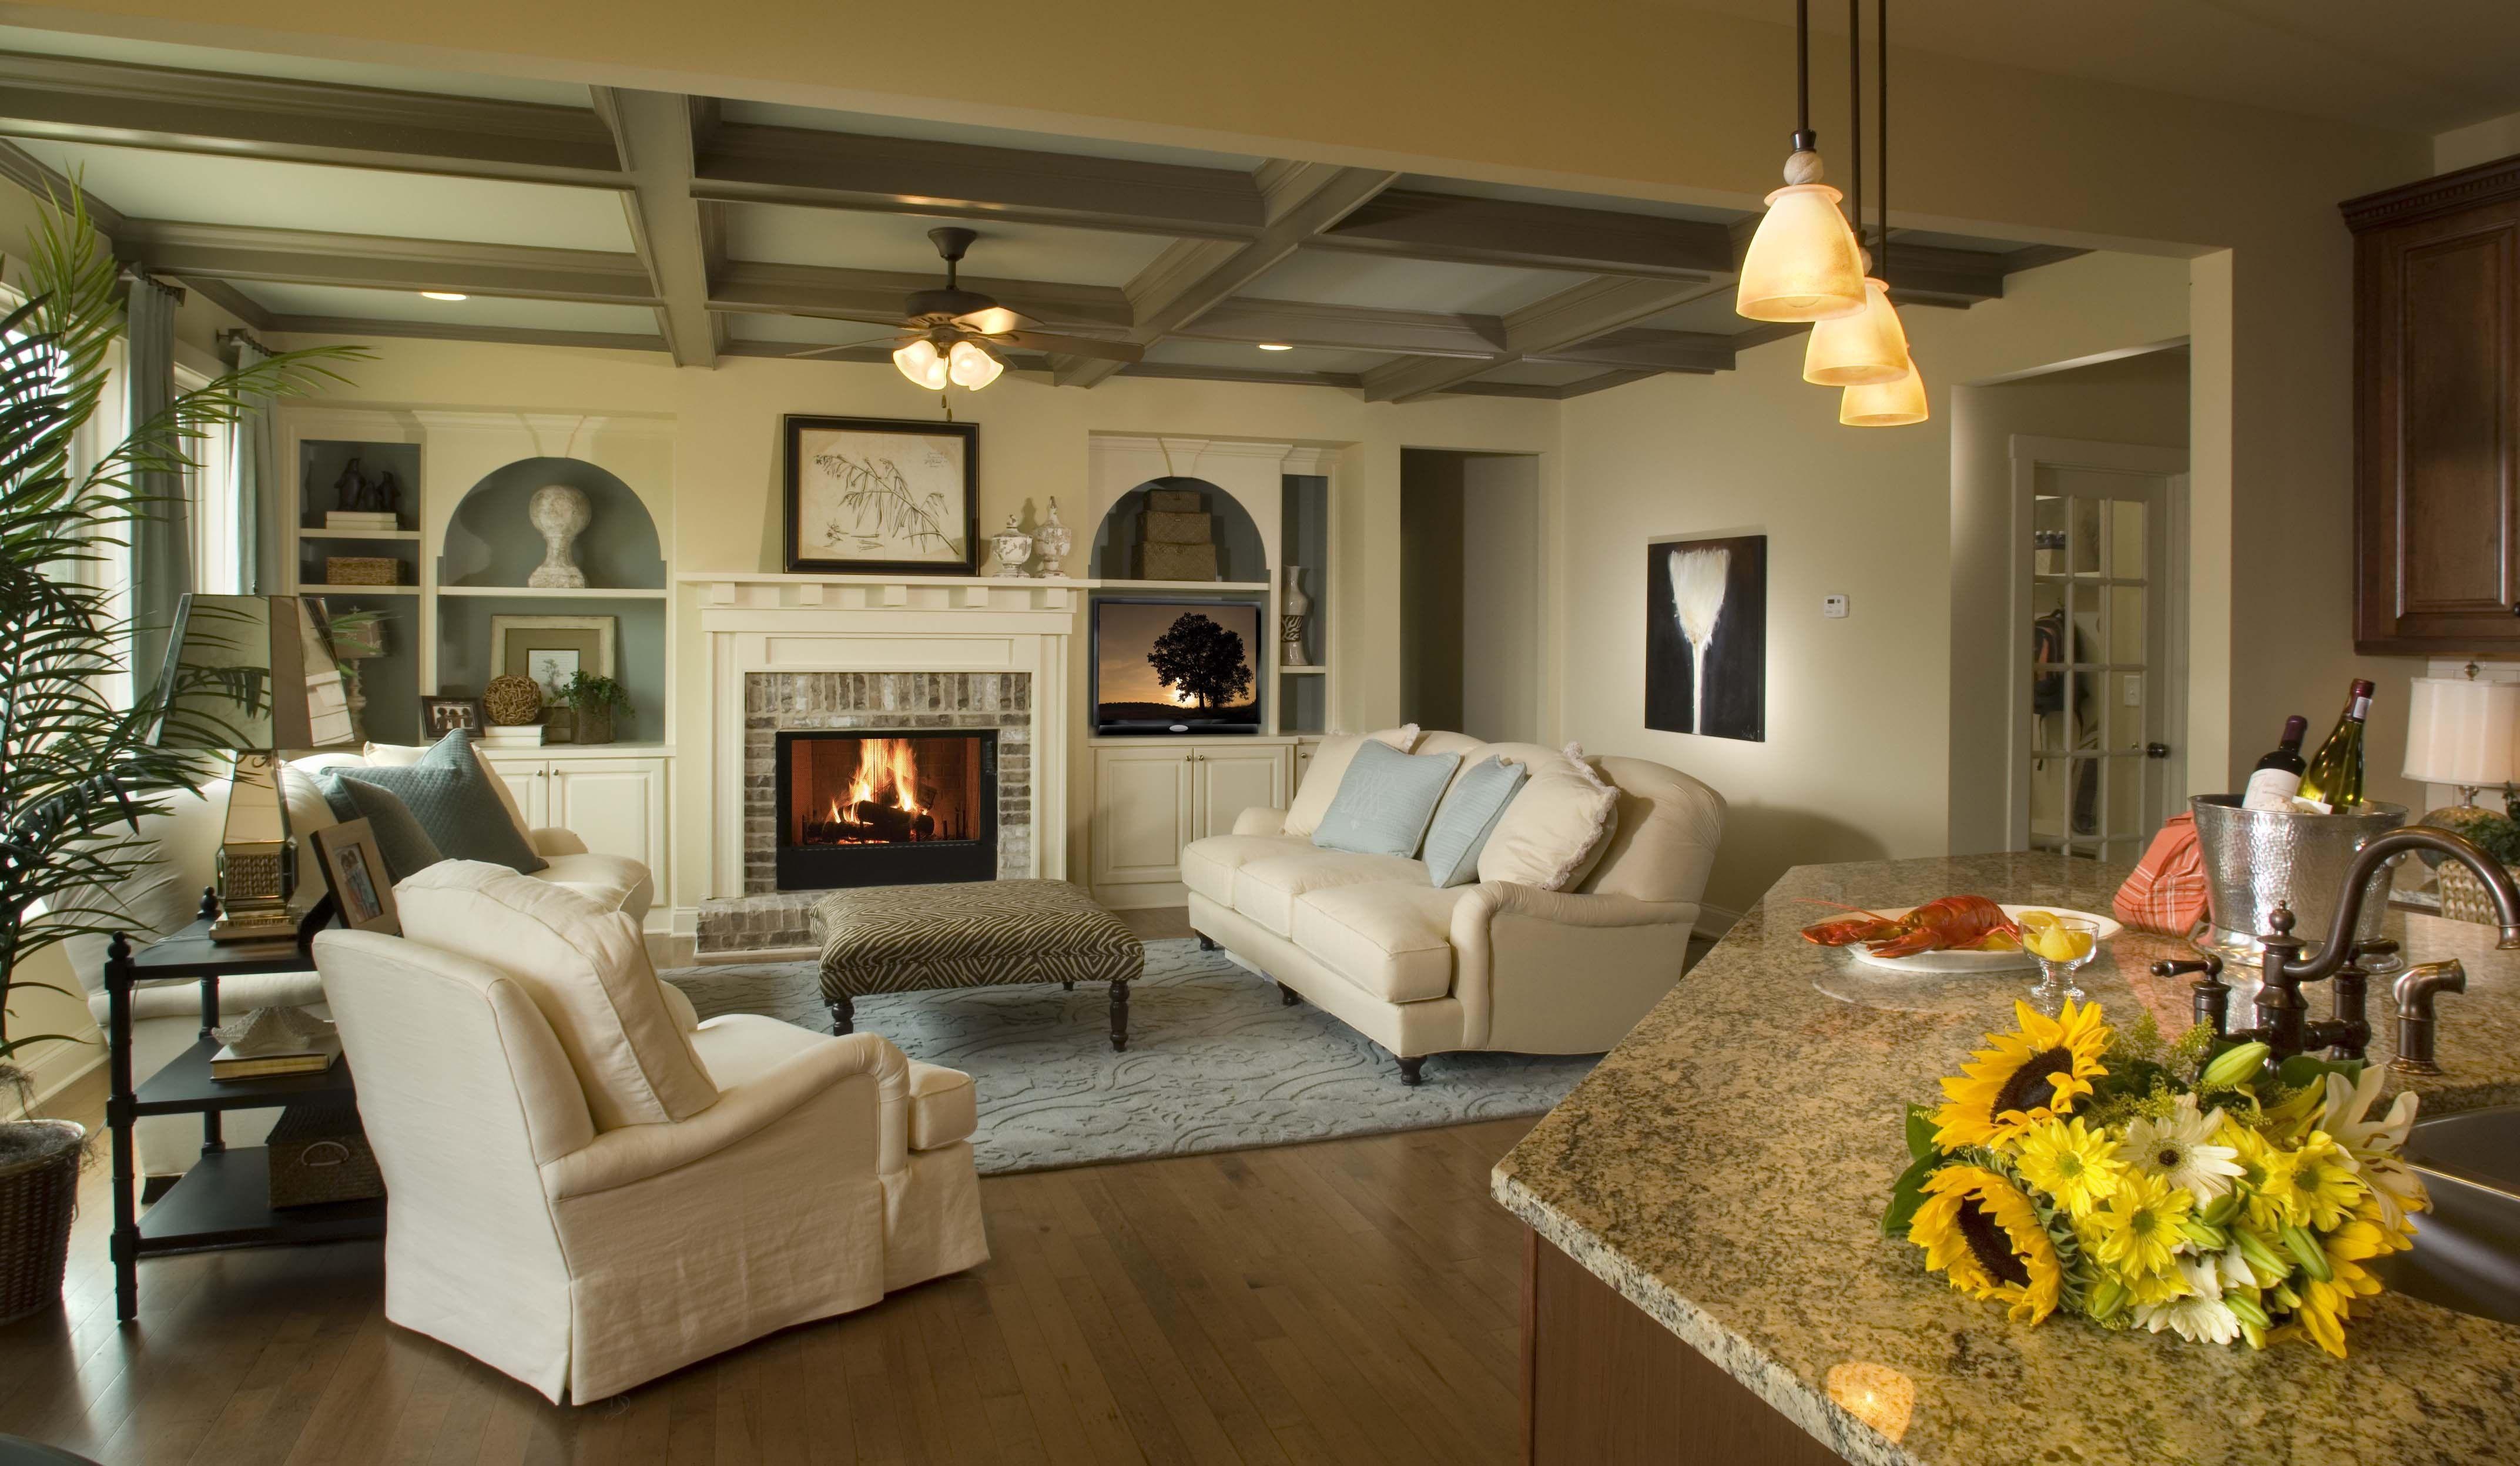 Master bedroom new design  Image result for glamorous black master bedroom with sitting room